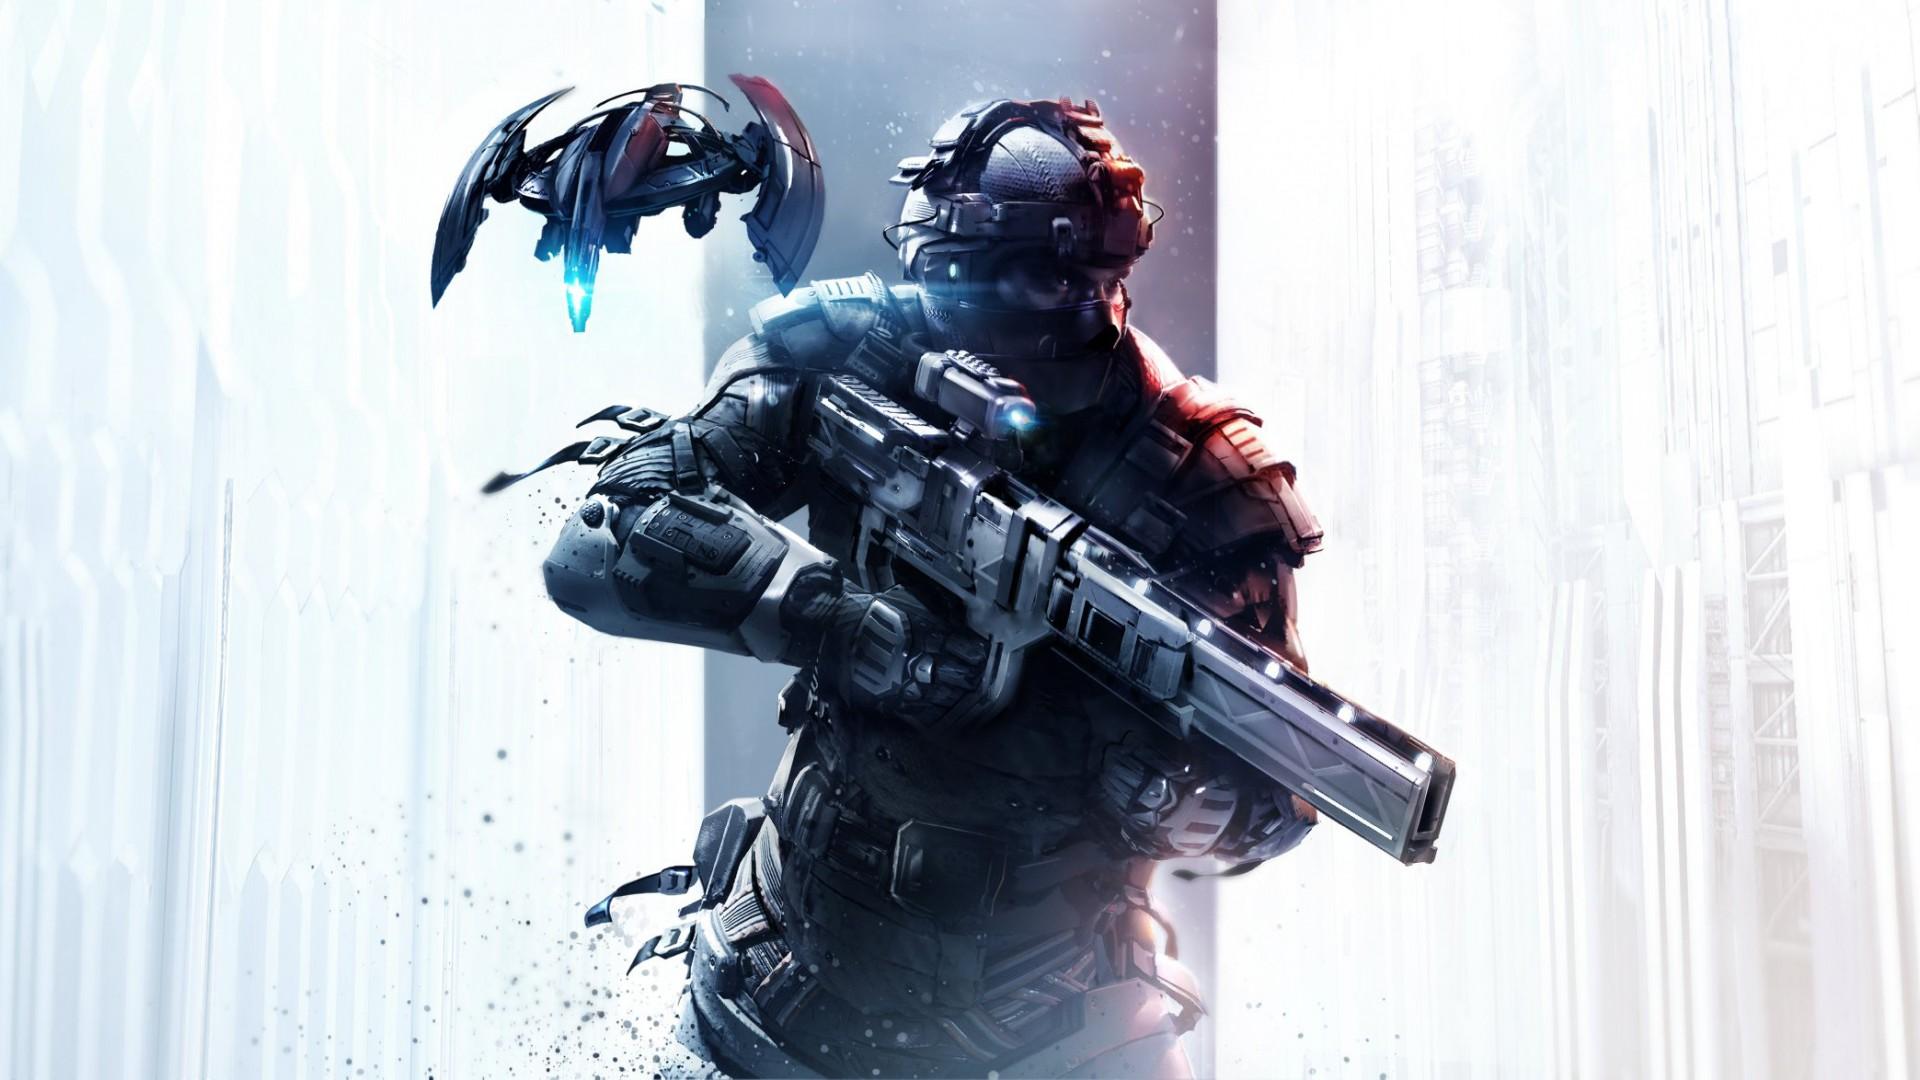 Killzone shadow fall full hd wallpaper and background image video game killzone shadow fall wallpaper voltagebd Gallery